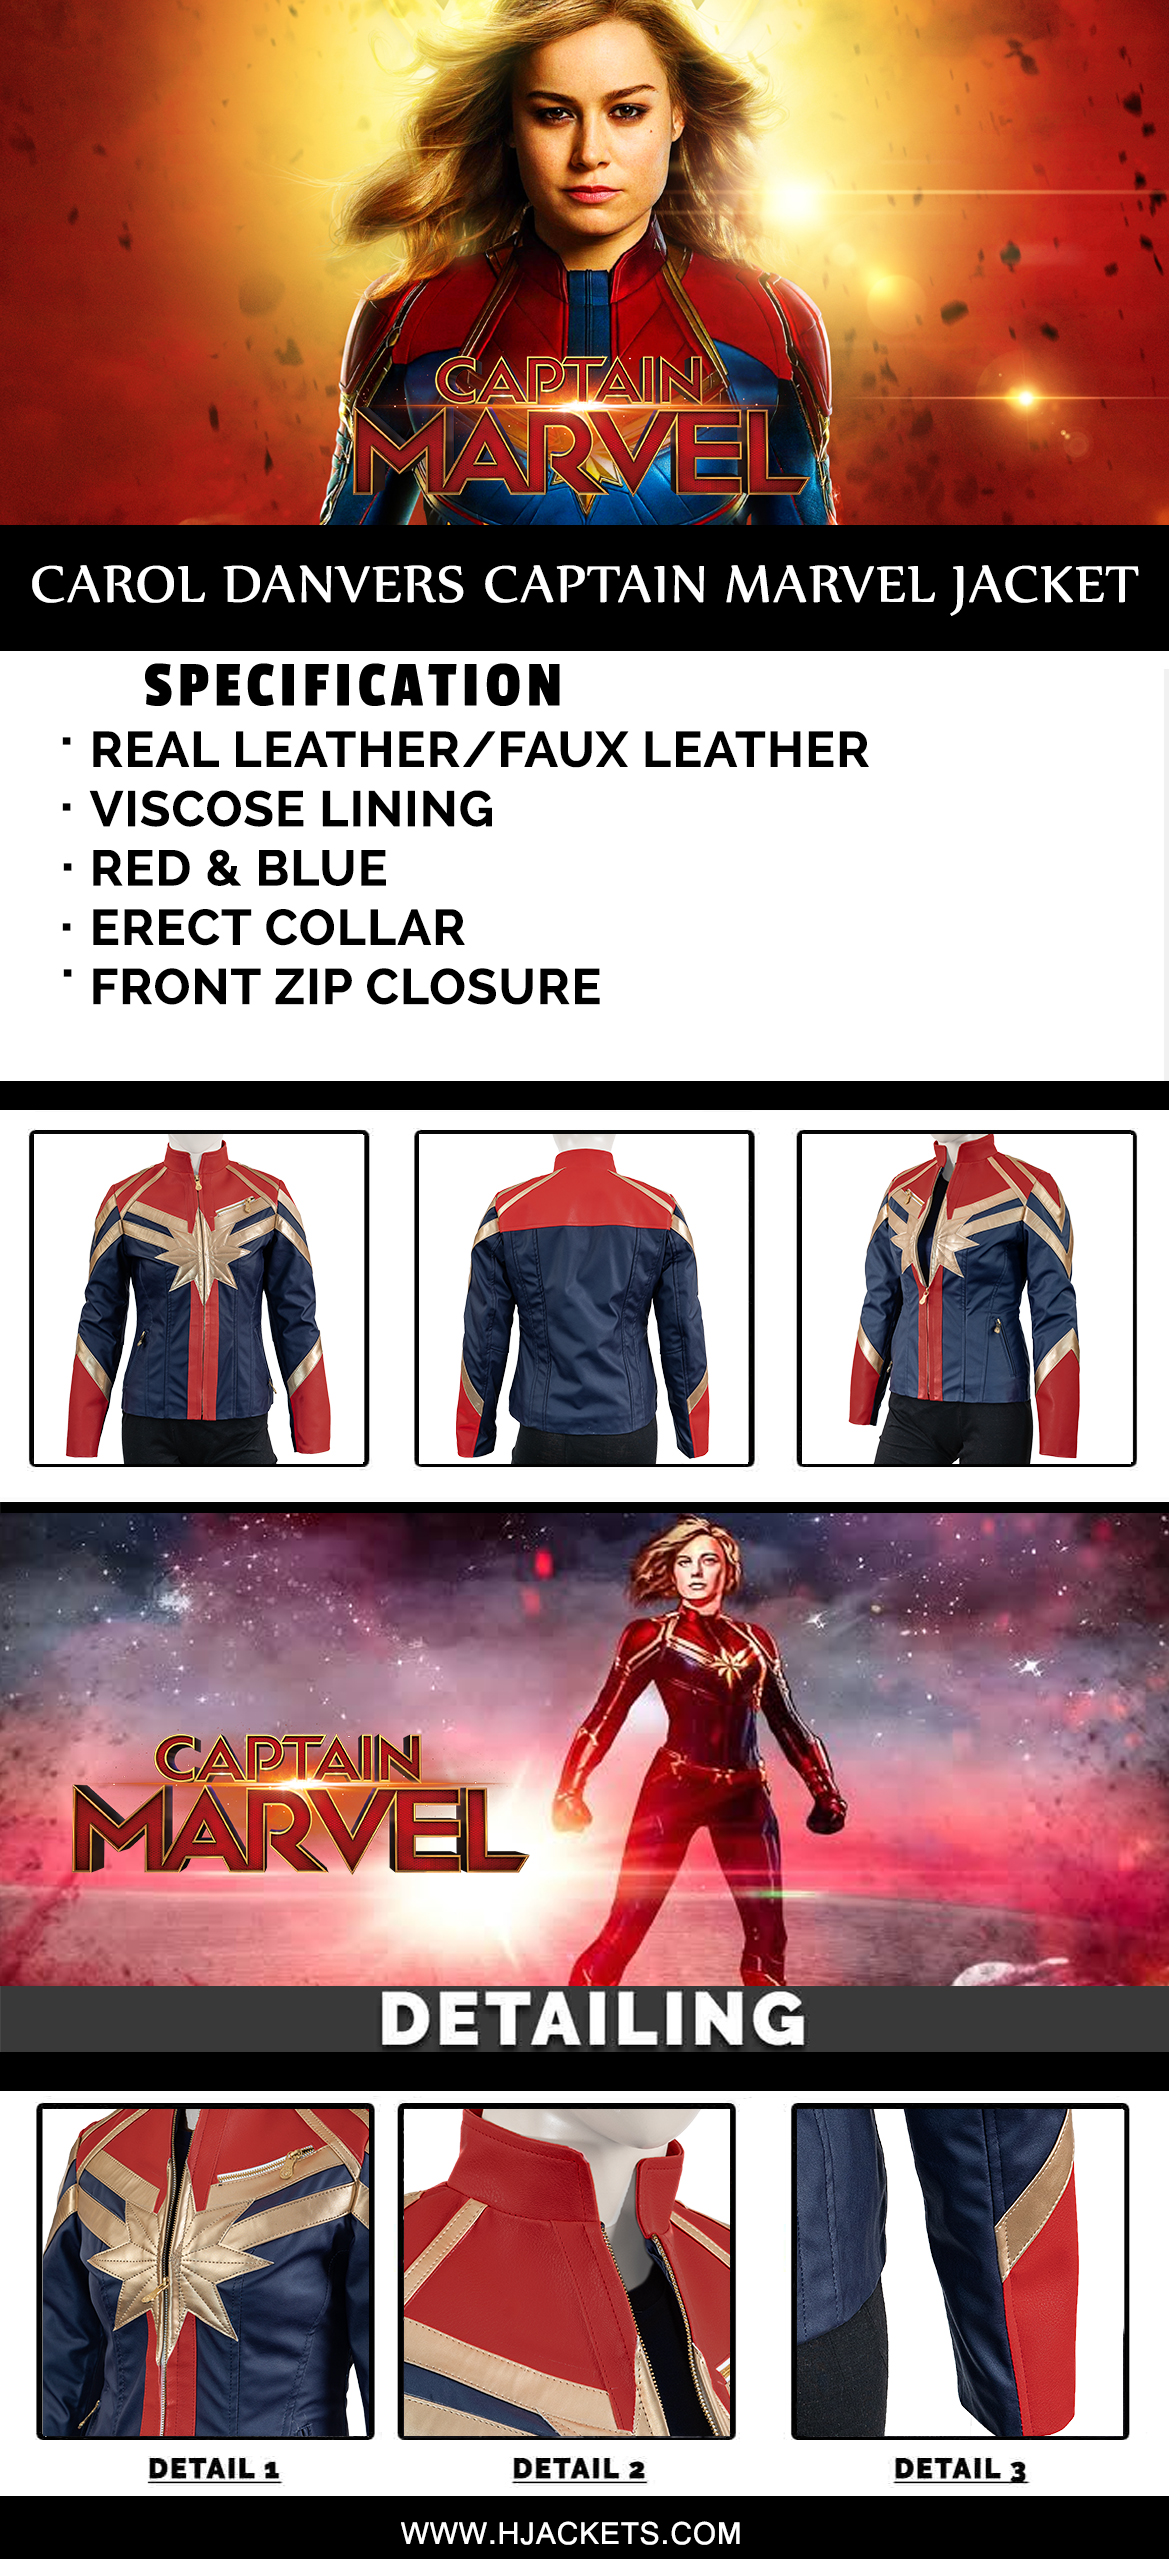 carol danvers captain marvel jacket infographic